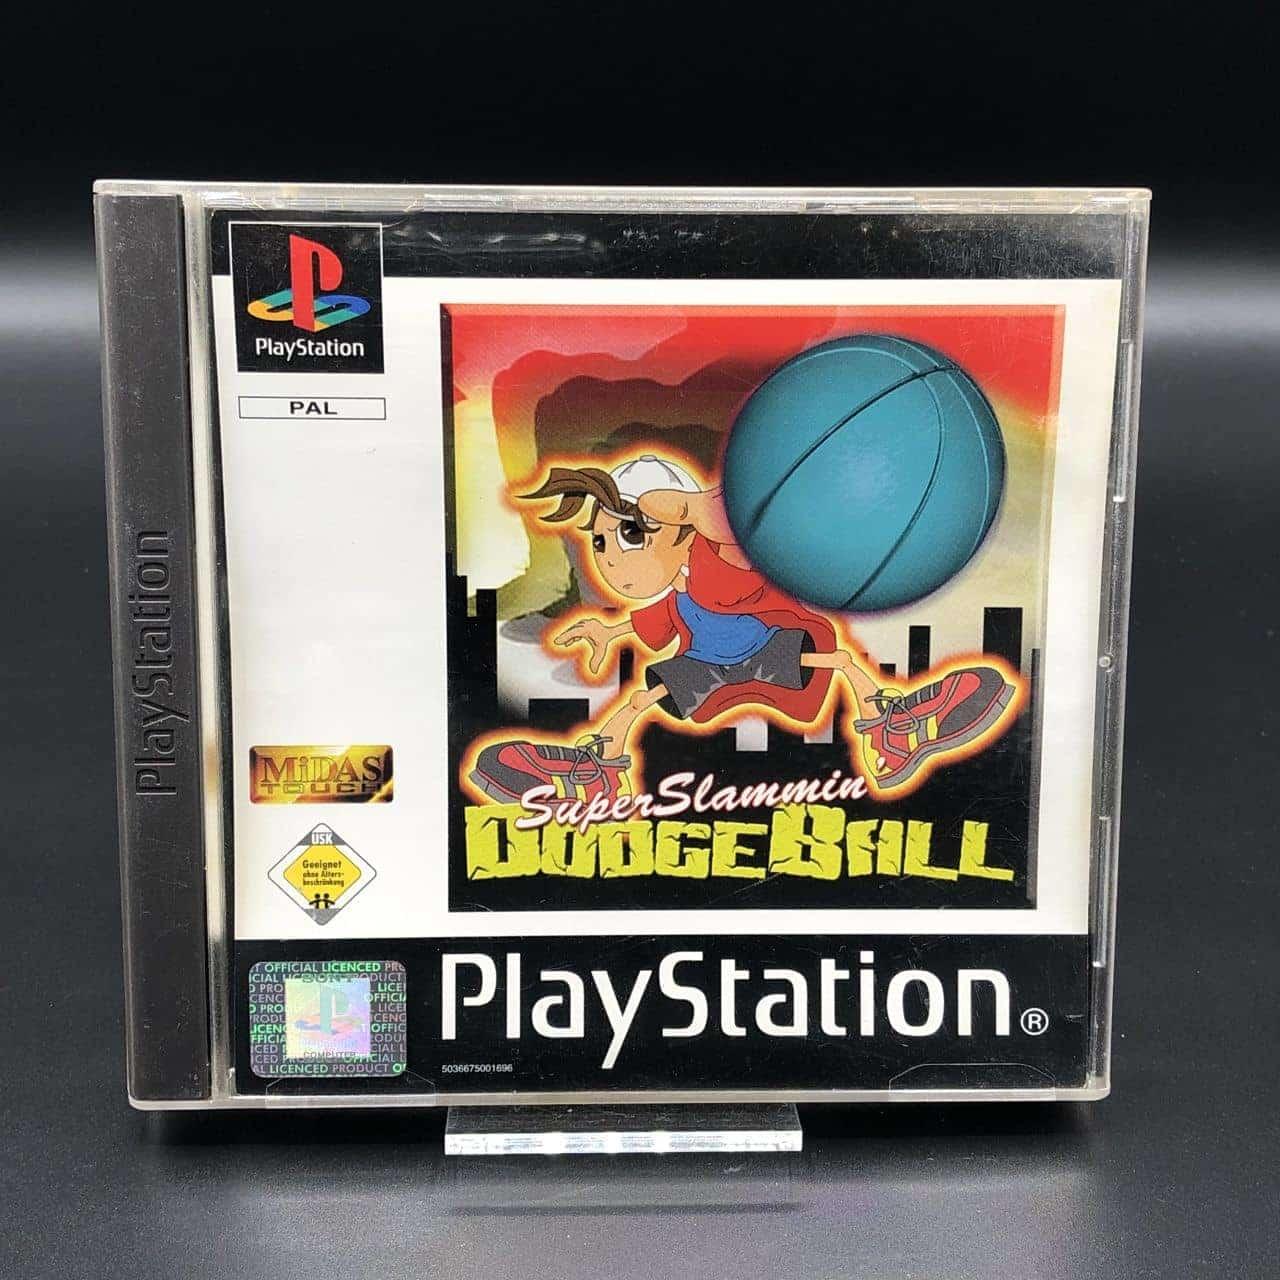 PS1 Super Slammin' Dodgeball (Midas Touch) (ohne Anleitung) (Gut) Sony PlayStation 1